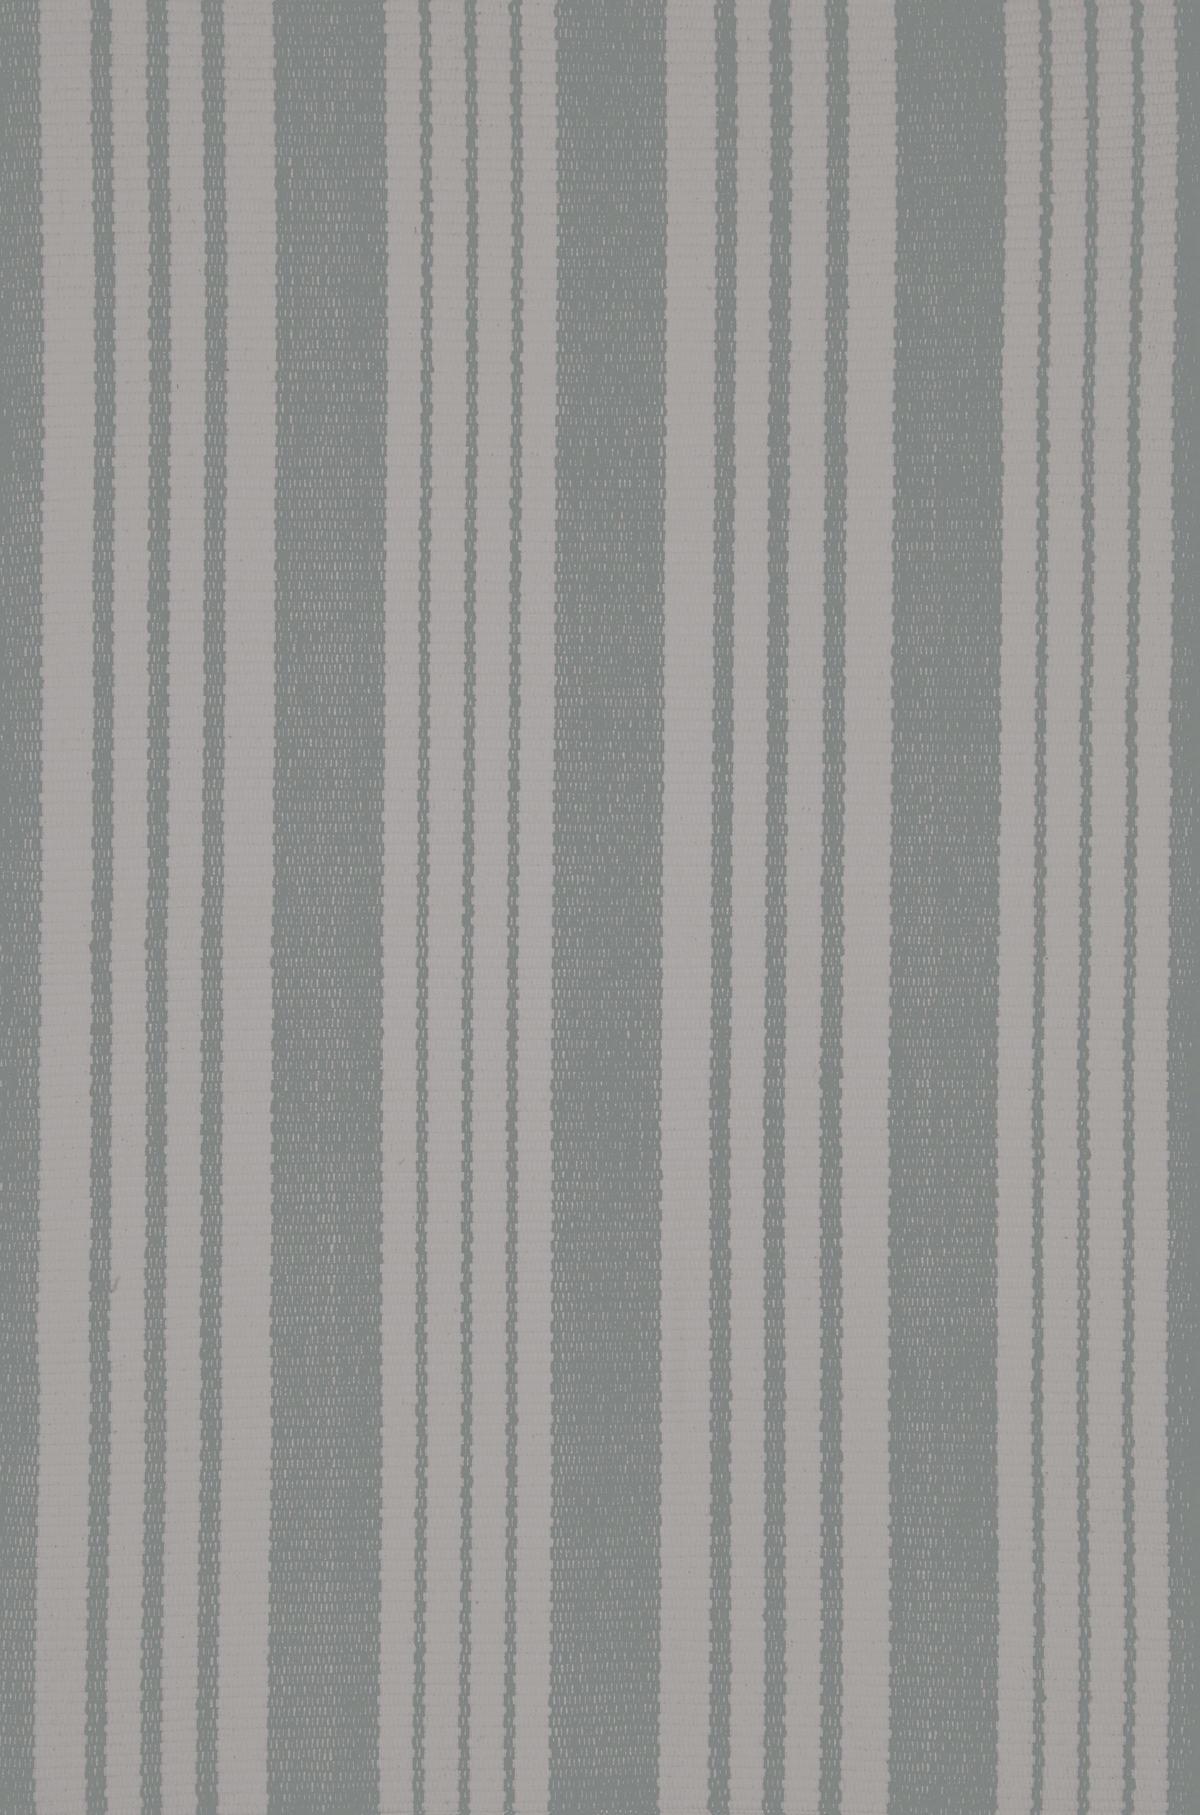 Birmingham Grey Woven Cotton Rug